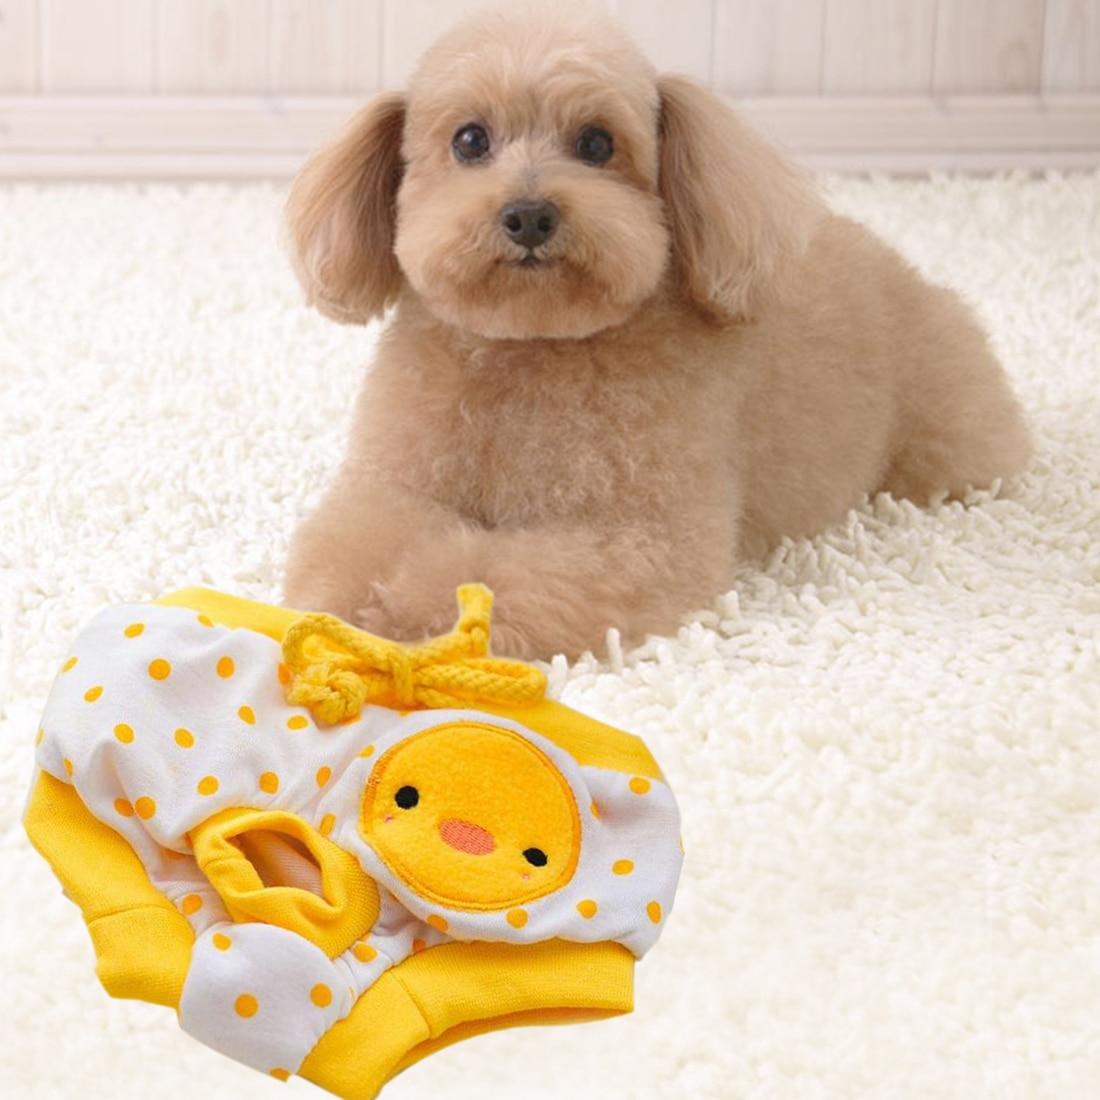 Big Sale Panty Pant Diaper Pet Underwear Pet Dog Puppy Diaper Pants Physiological Sanitary Short Panty Nappy Underwear